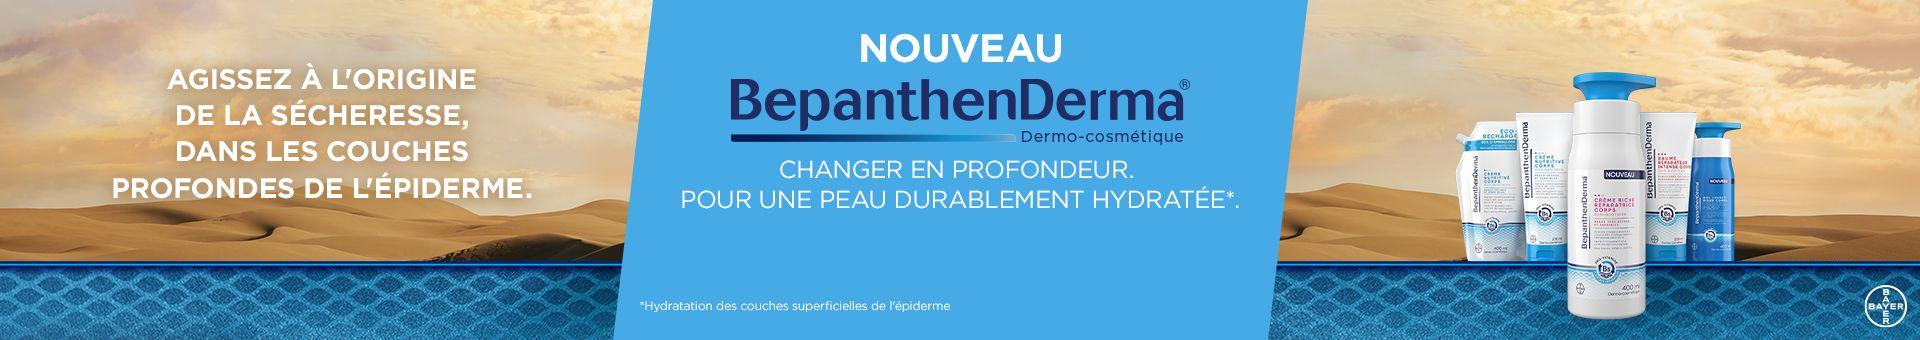 Pharmacie Dupont,Versailles